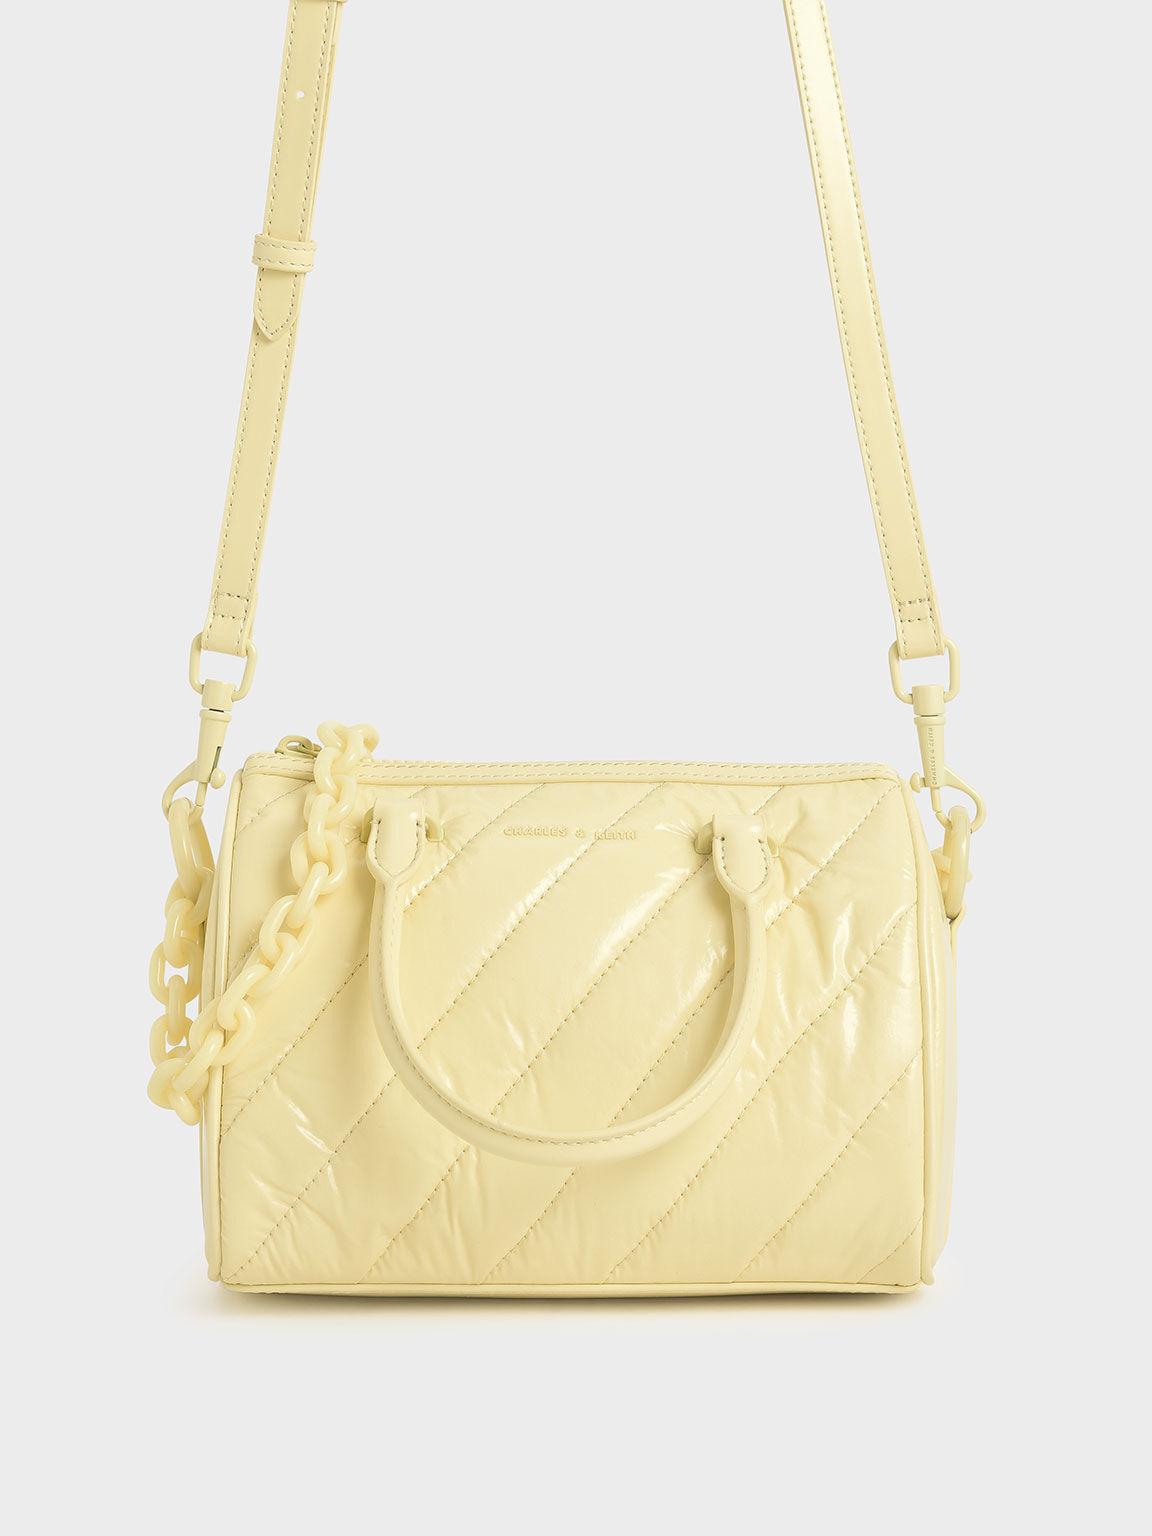 Glow-In-The-Dark Tote Bag, Butter, hi-res